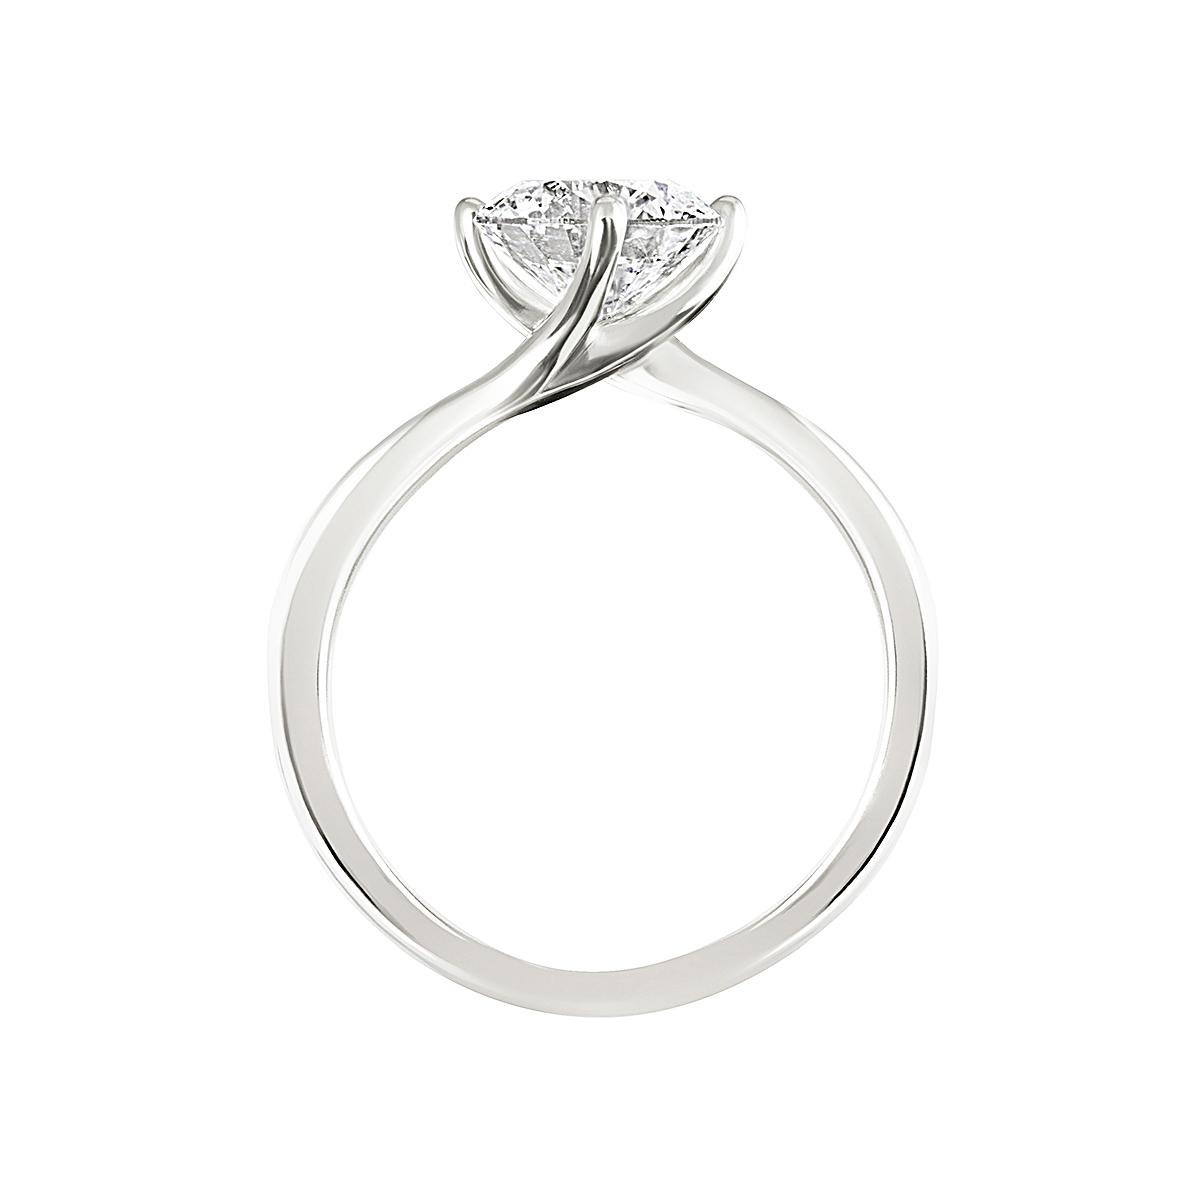 Grace-white-gold-solitaire-diamond-engagement-ring-profile.jpg